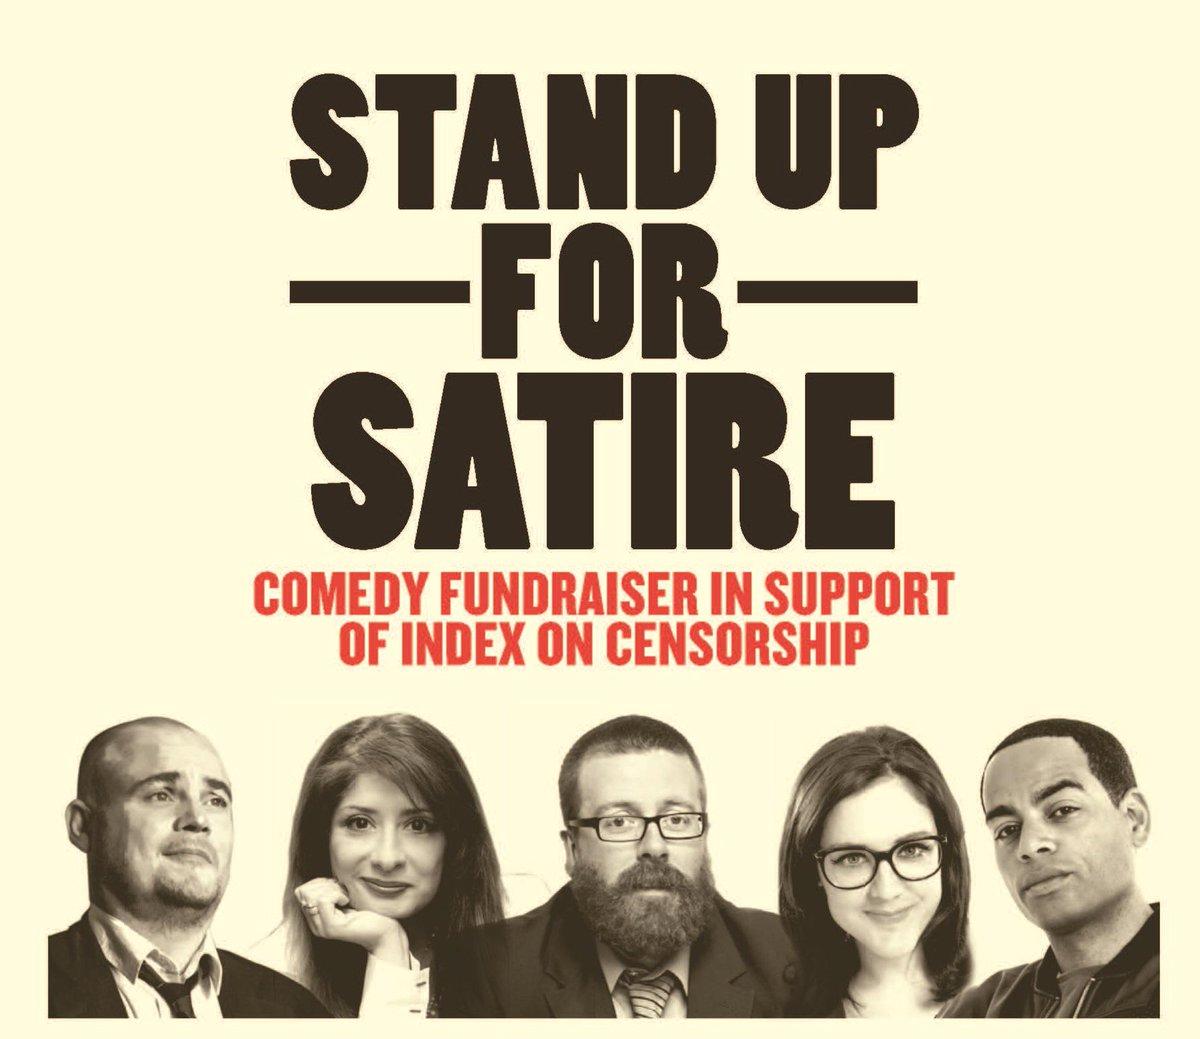 satire and comedy